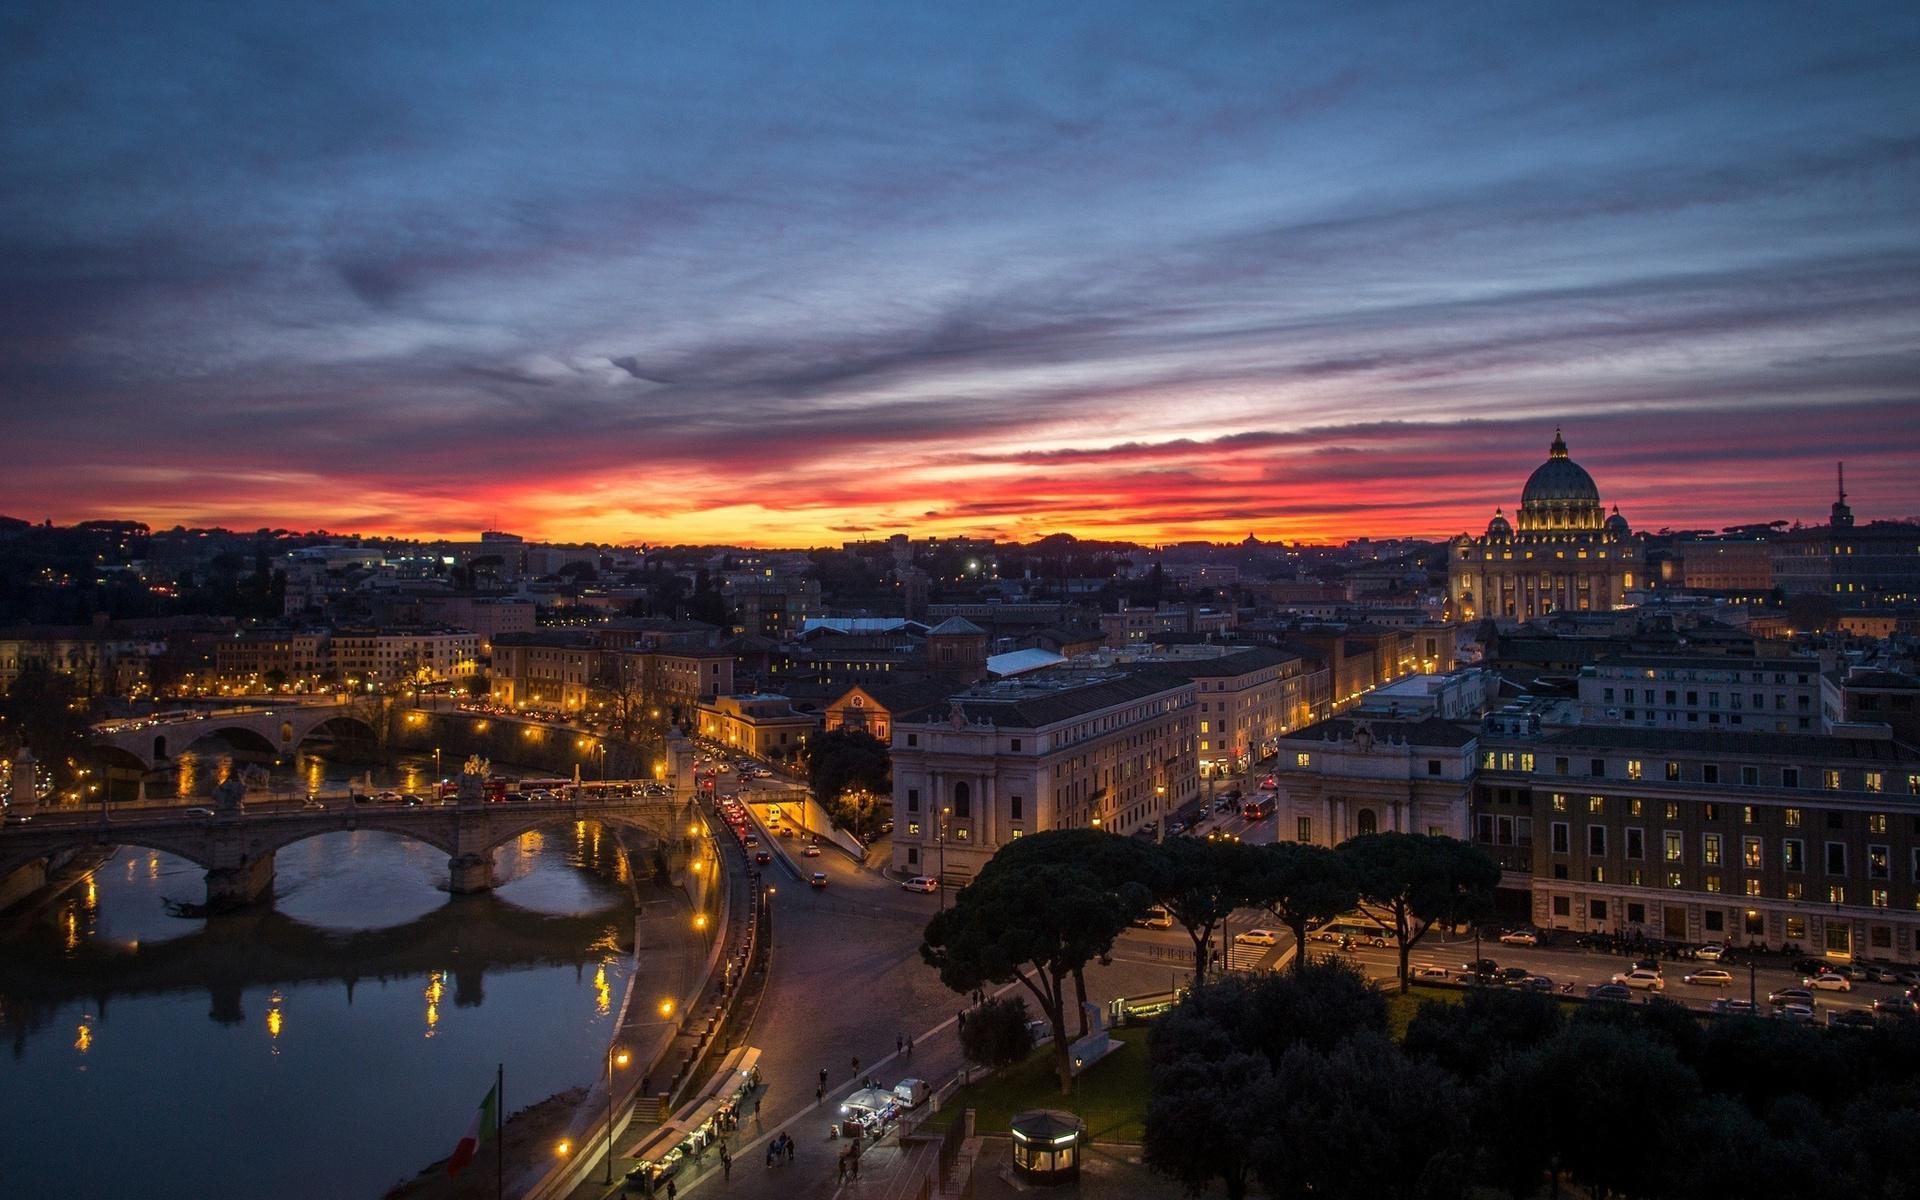 Desktop Wallpaper Hd 3d Full Screen Baby Rome Vatican City Night Sunset Panorama Houses Buildings